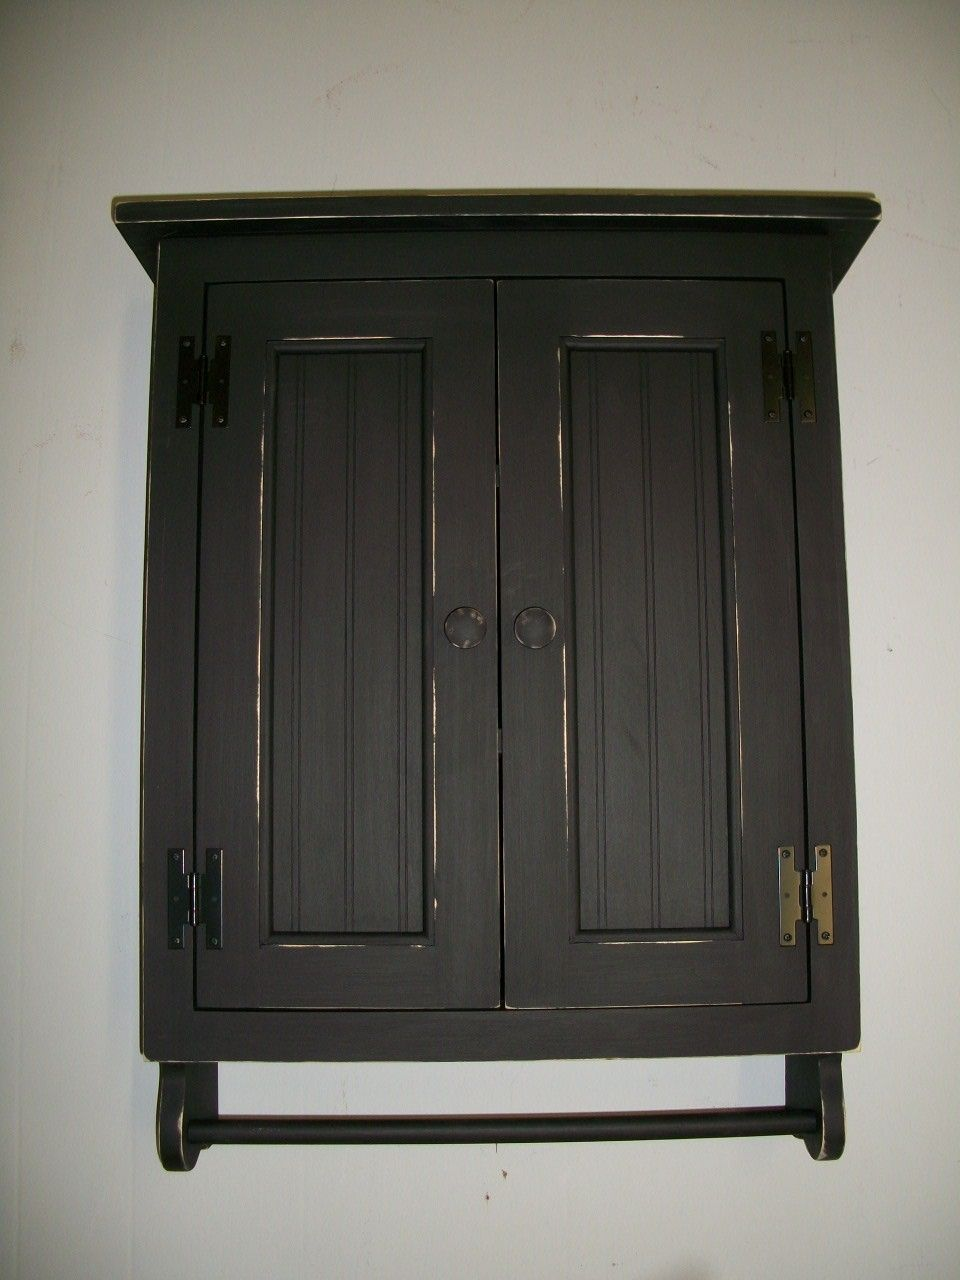 Black wall cabinet for kitchen | Primitive cabinets, Black ...